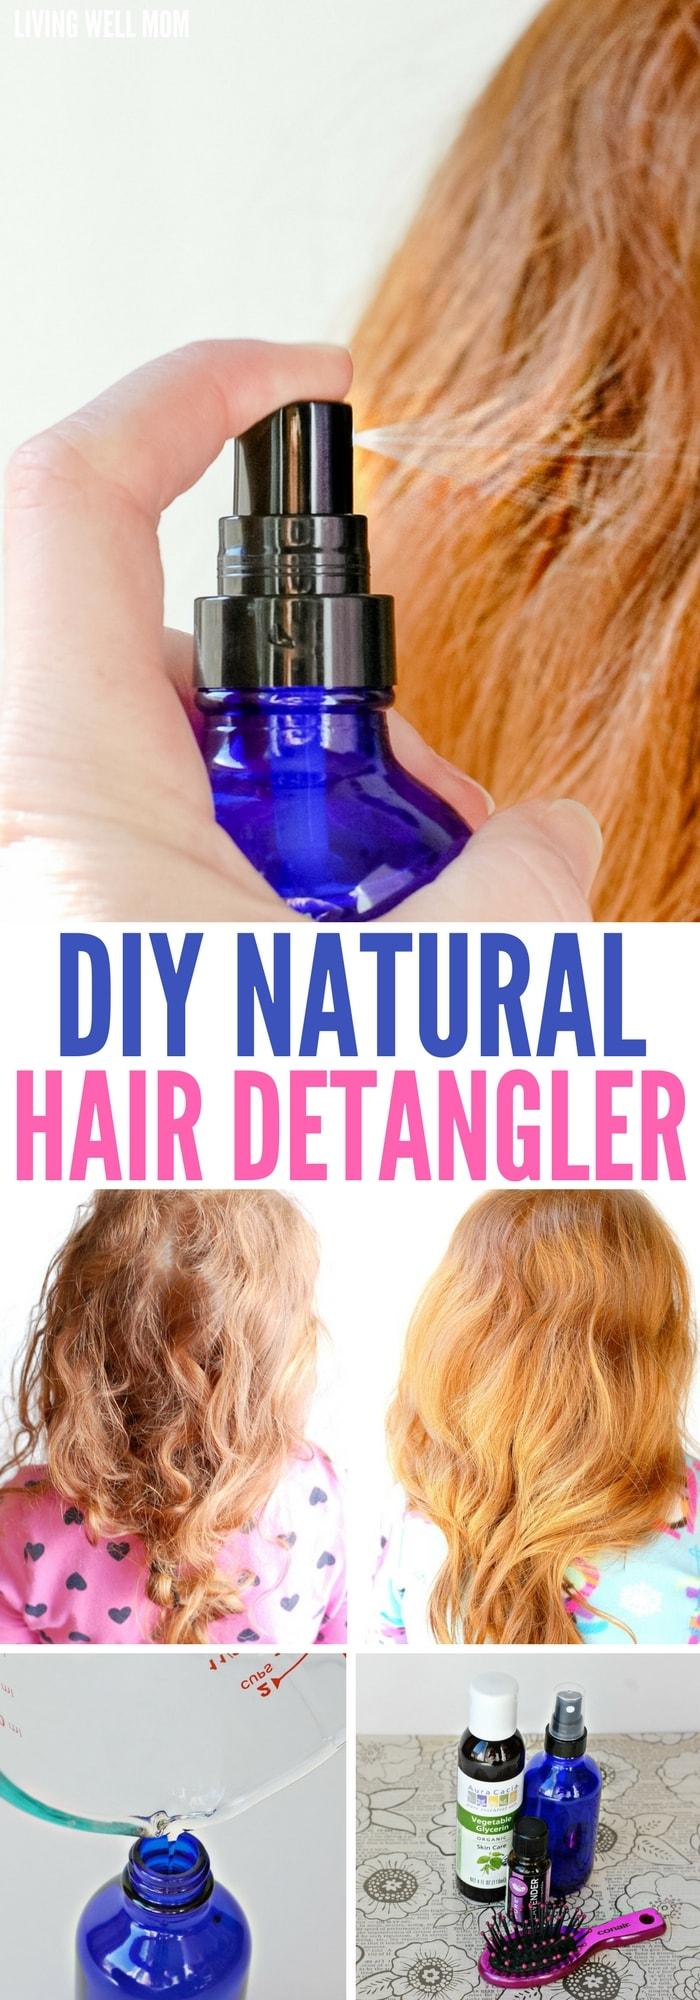 DIY Natural Hair Detangler with Essential Oils